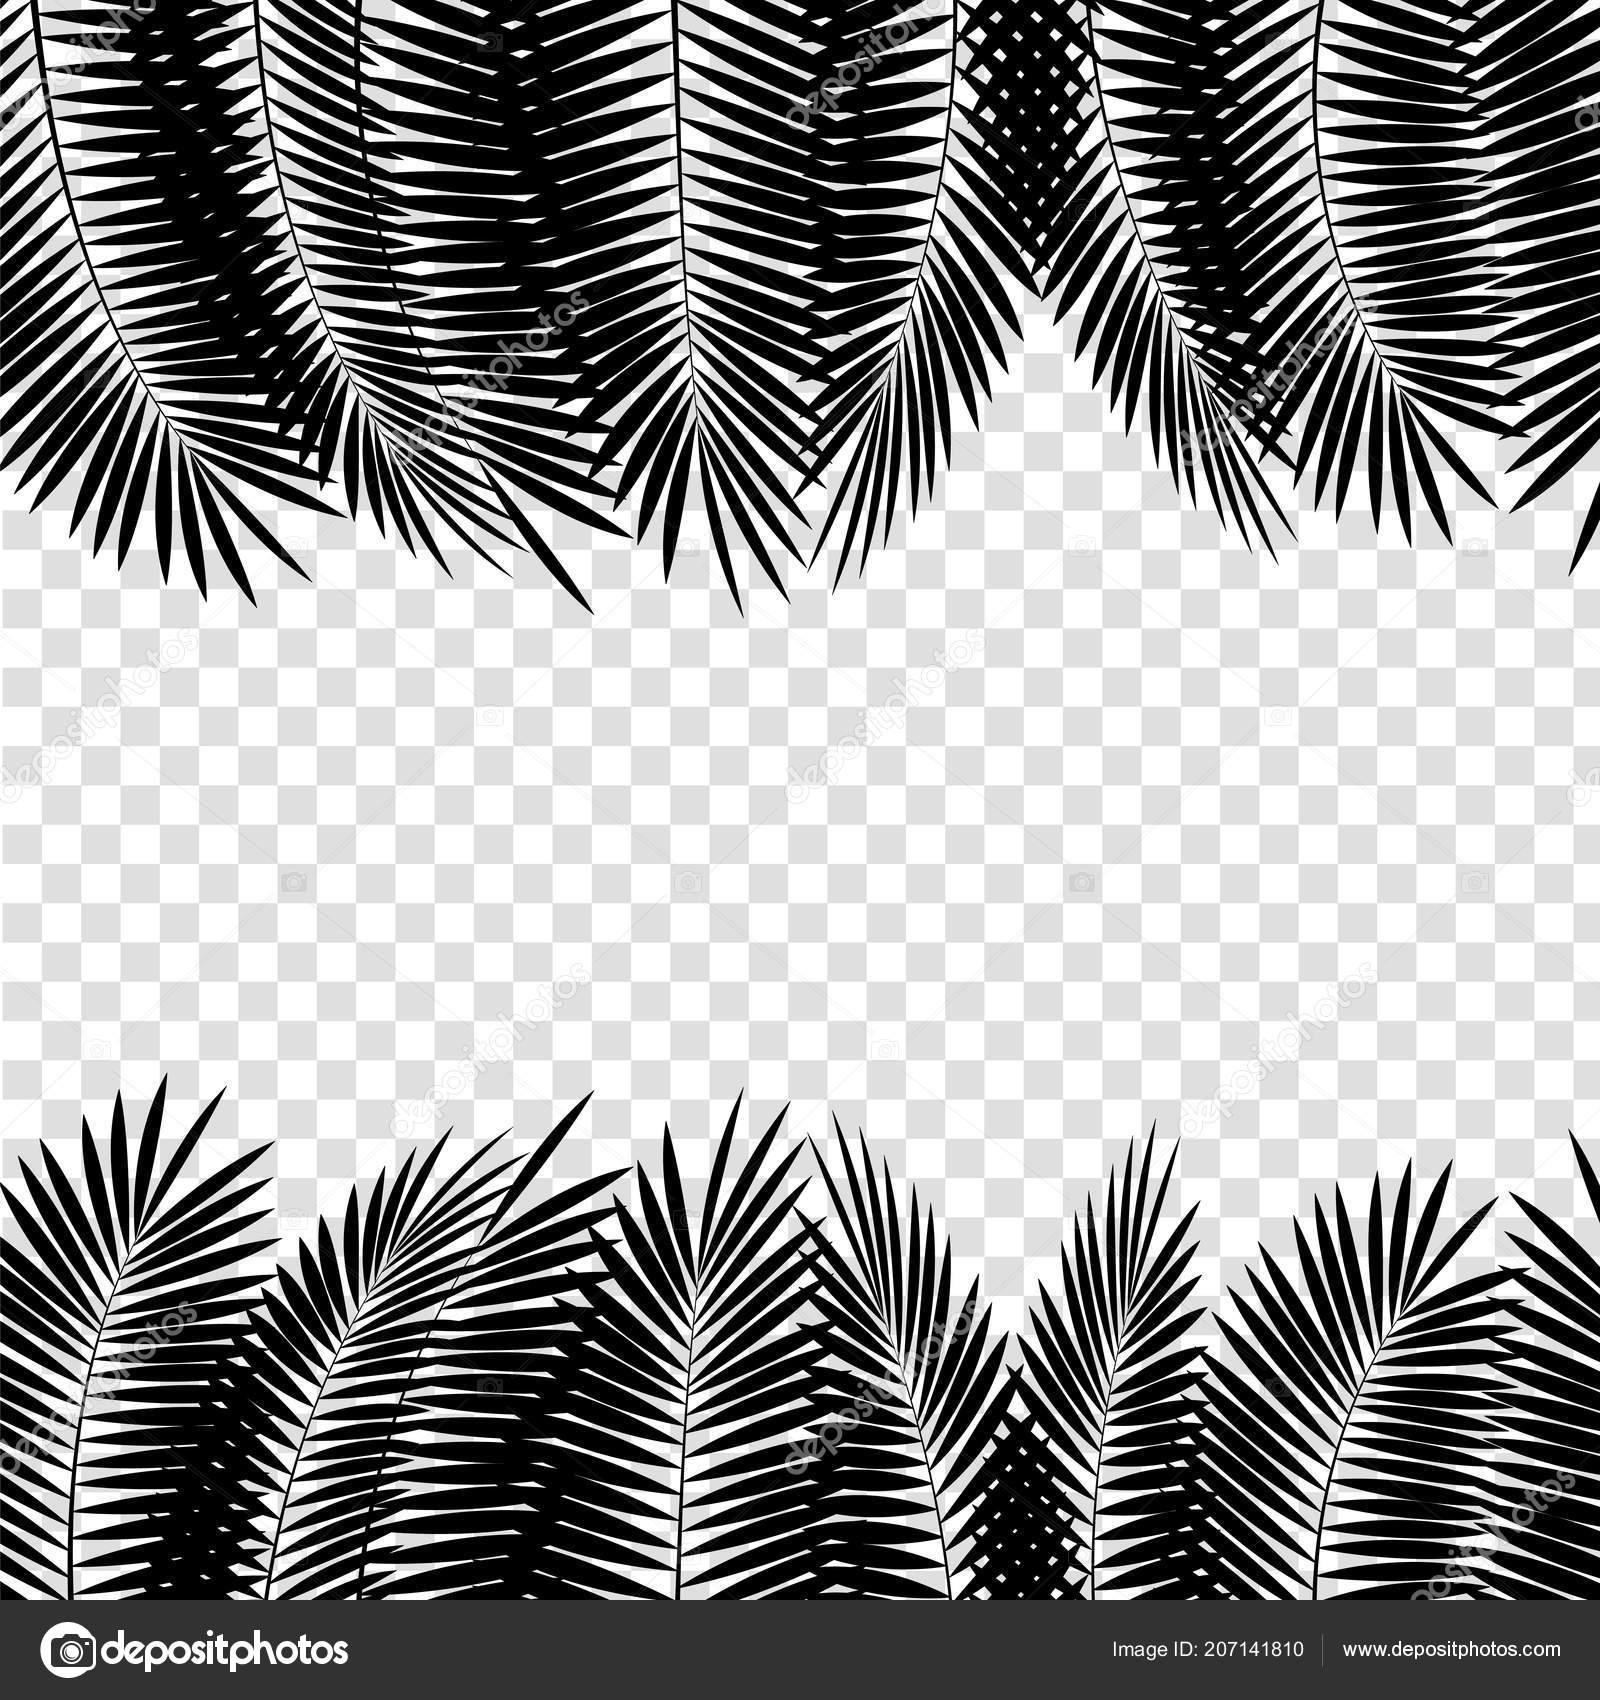 Download 620 Background Black White Vector Gratis Terbaik